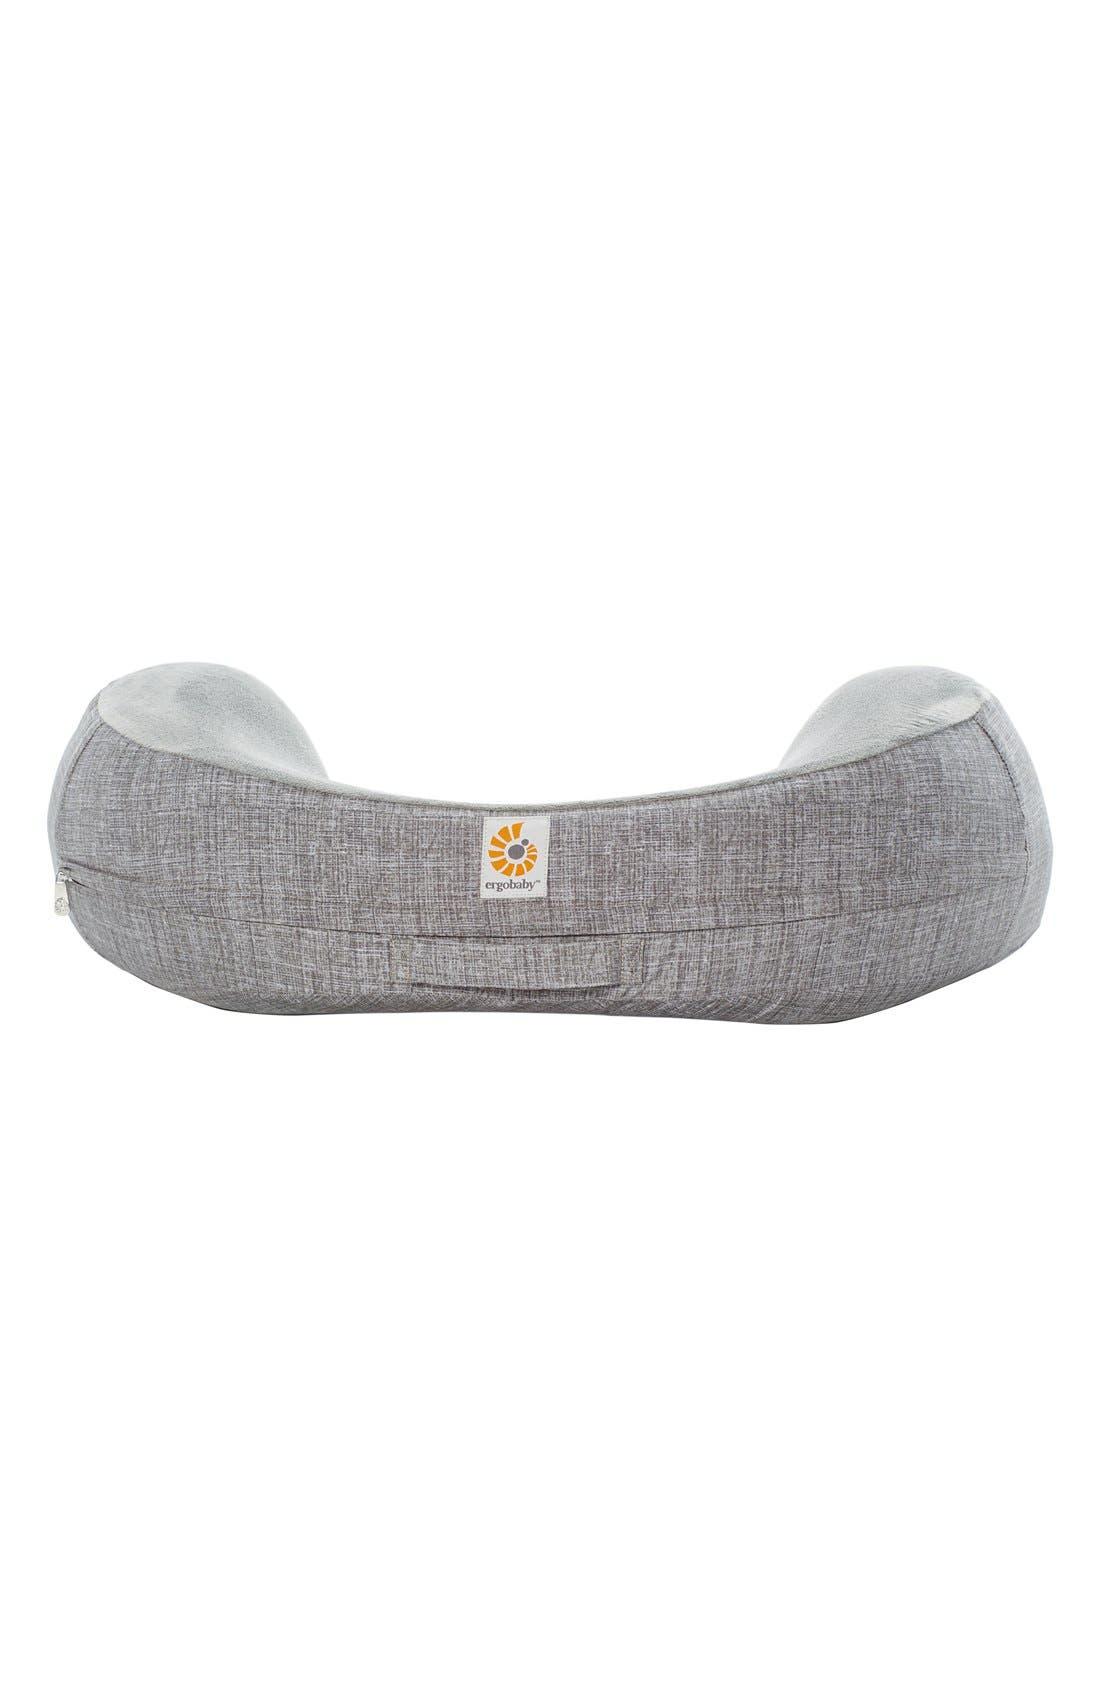 'Natural Curve<sup>™</sup>' Nursing Pillow,                         Main,                         color, Heathered Grey